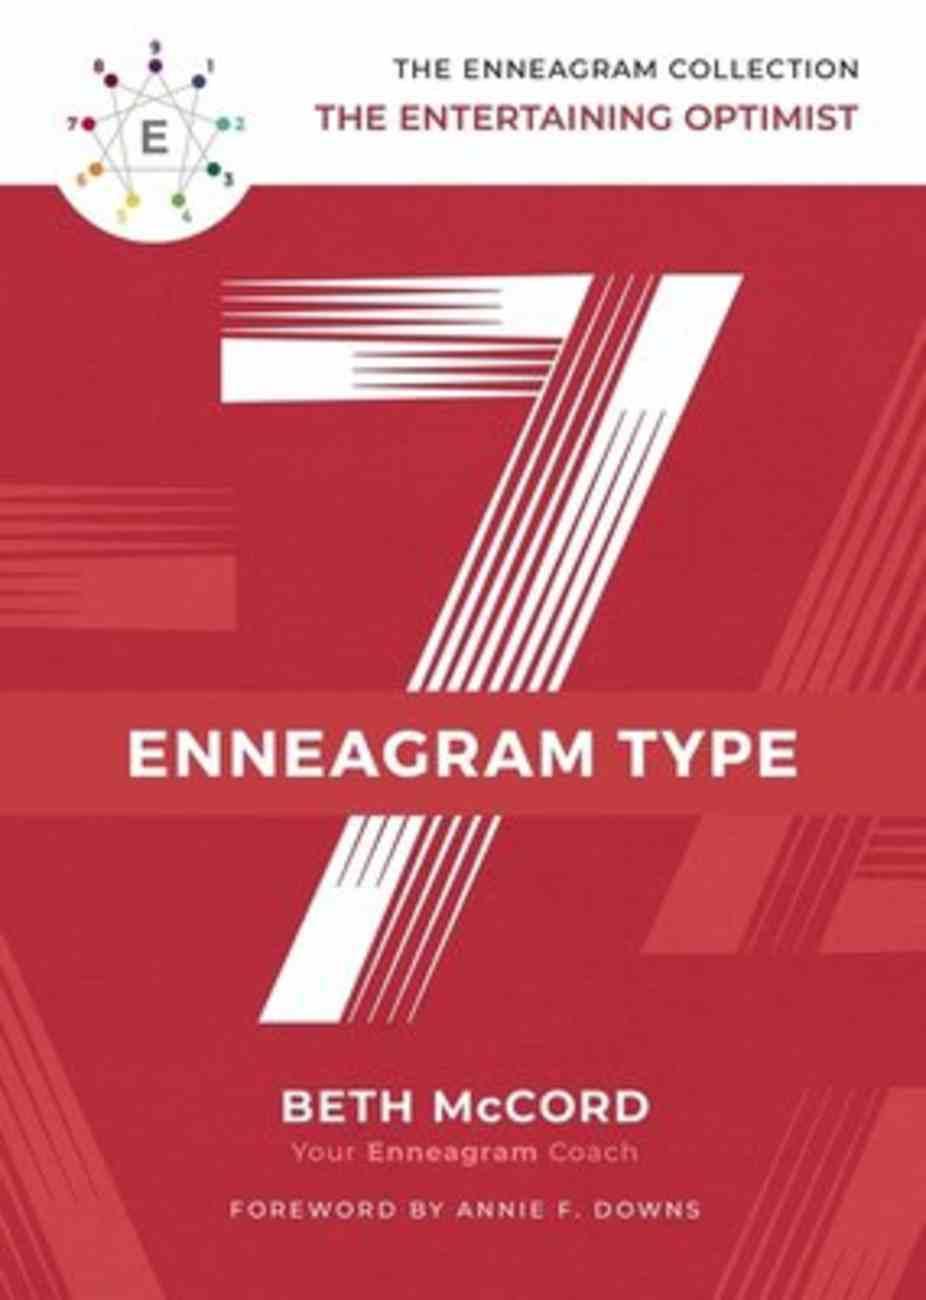 Enneagram Collection Type 7: The Entertaining Optimist (Enneagram Collection) Hardback